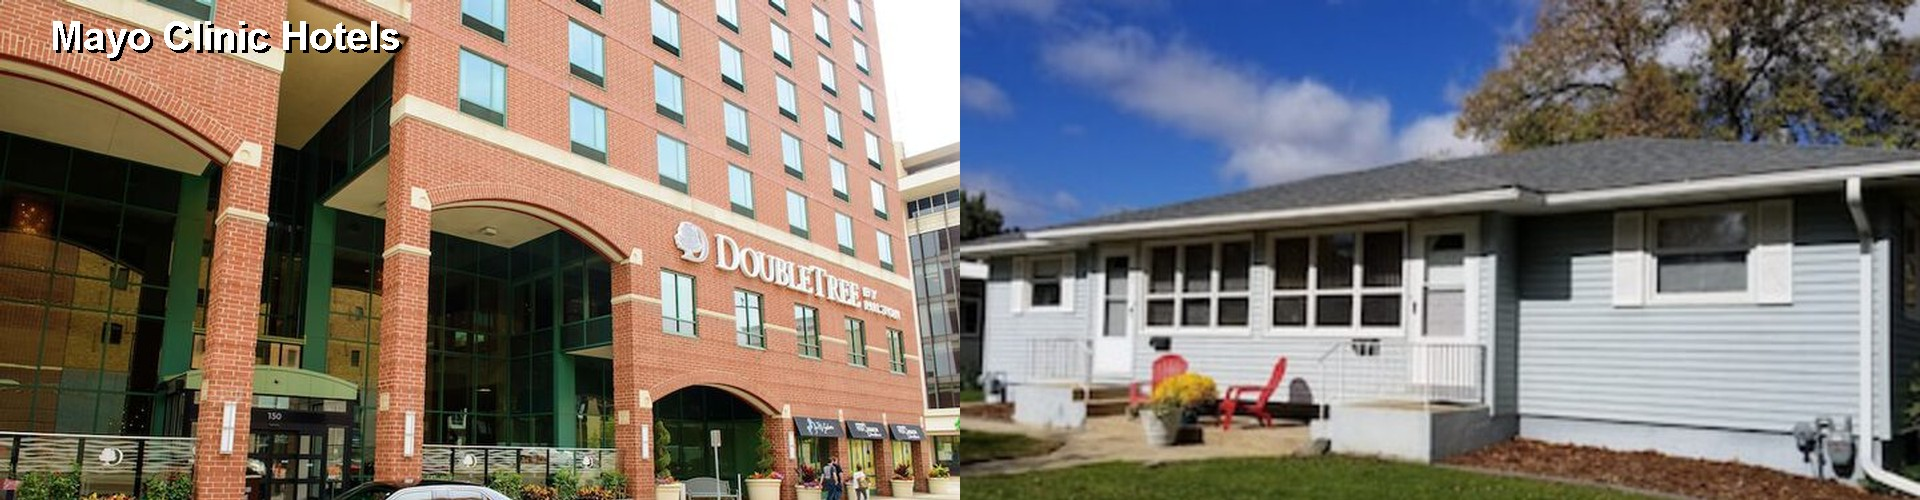 5 Best Hotels Near Mayo Clinic